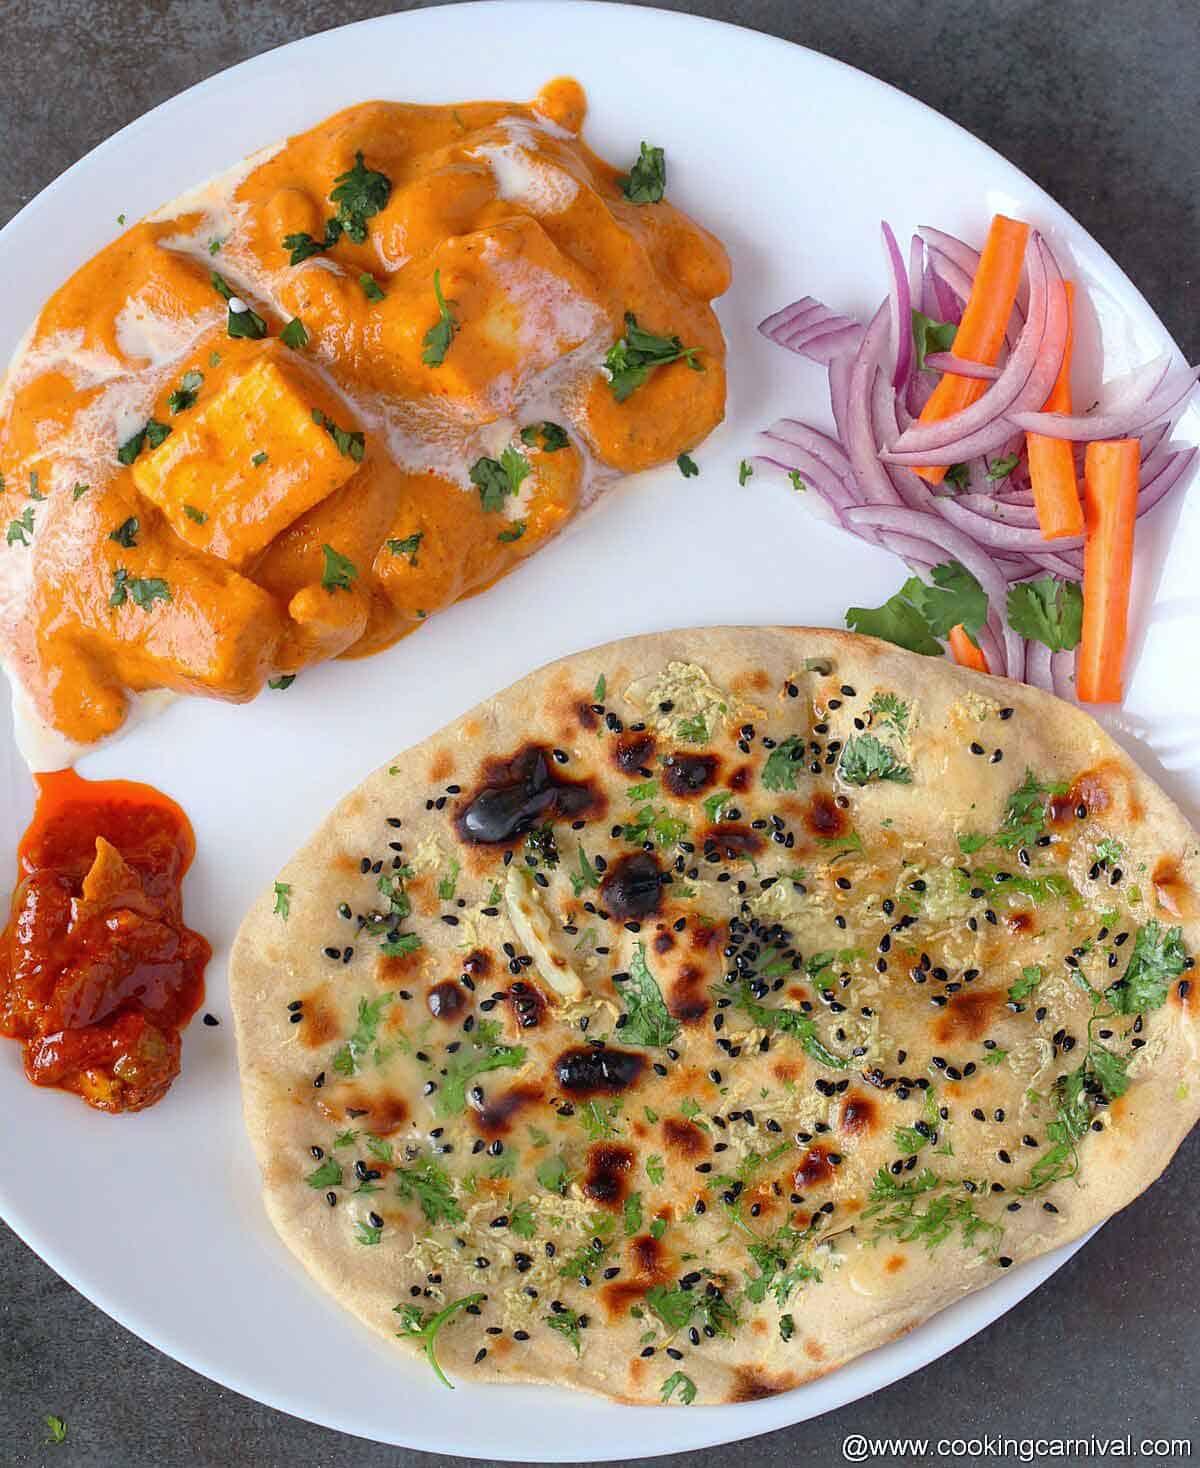 Tandoori garlic roti, kaju paneer, salad and pickle on white plate